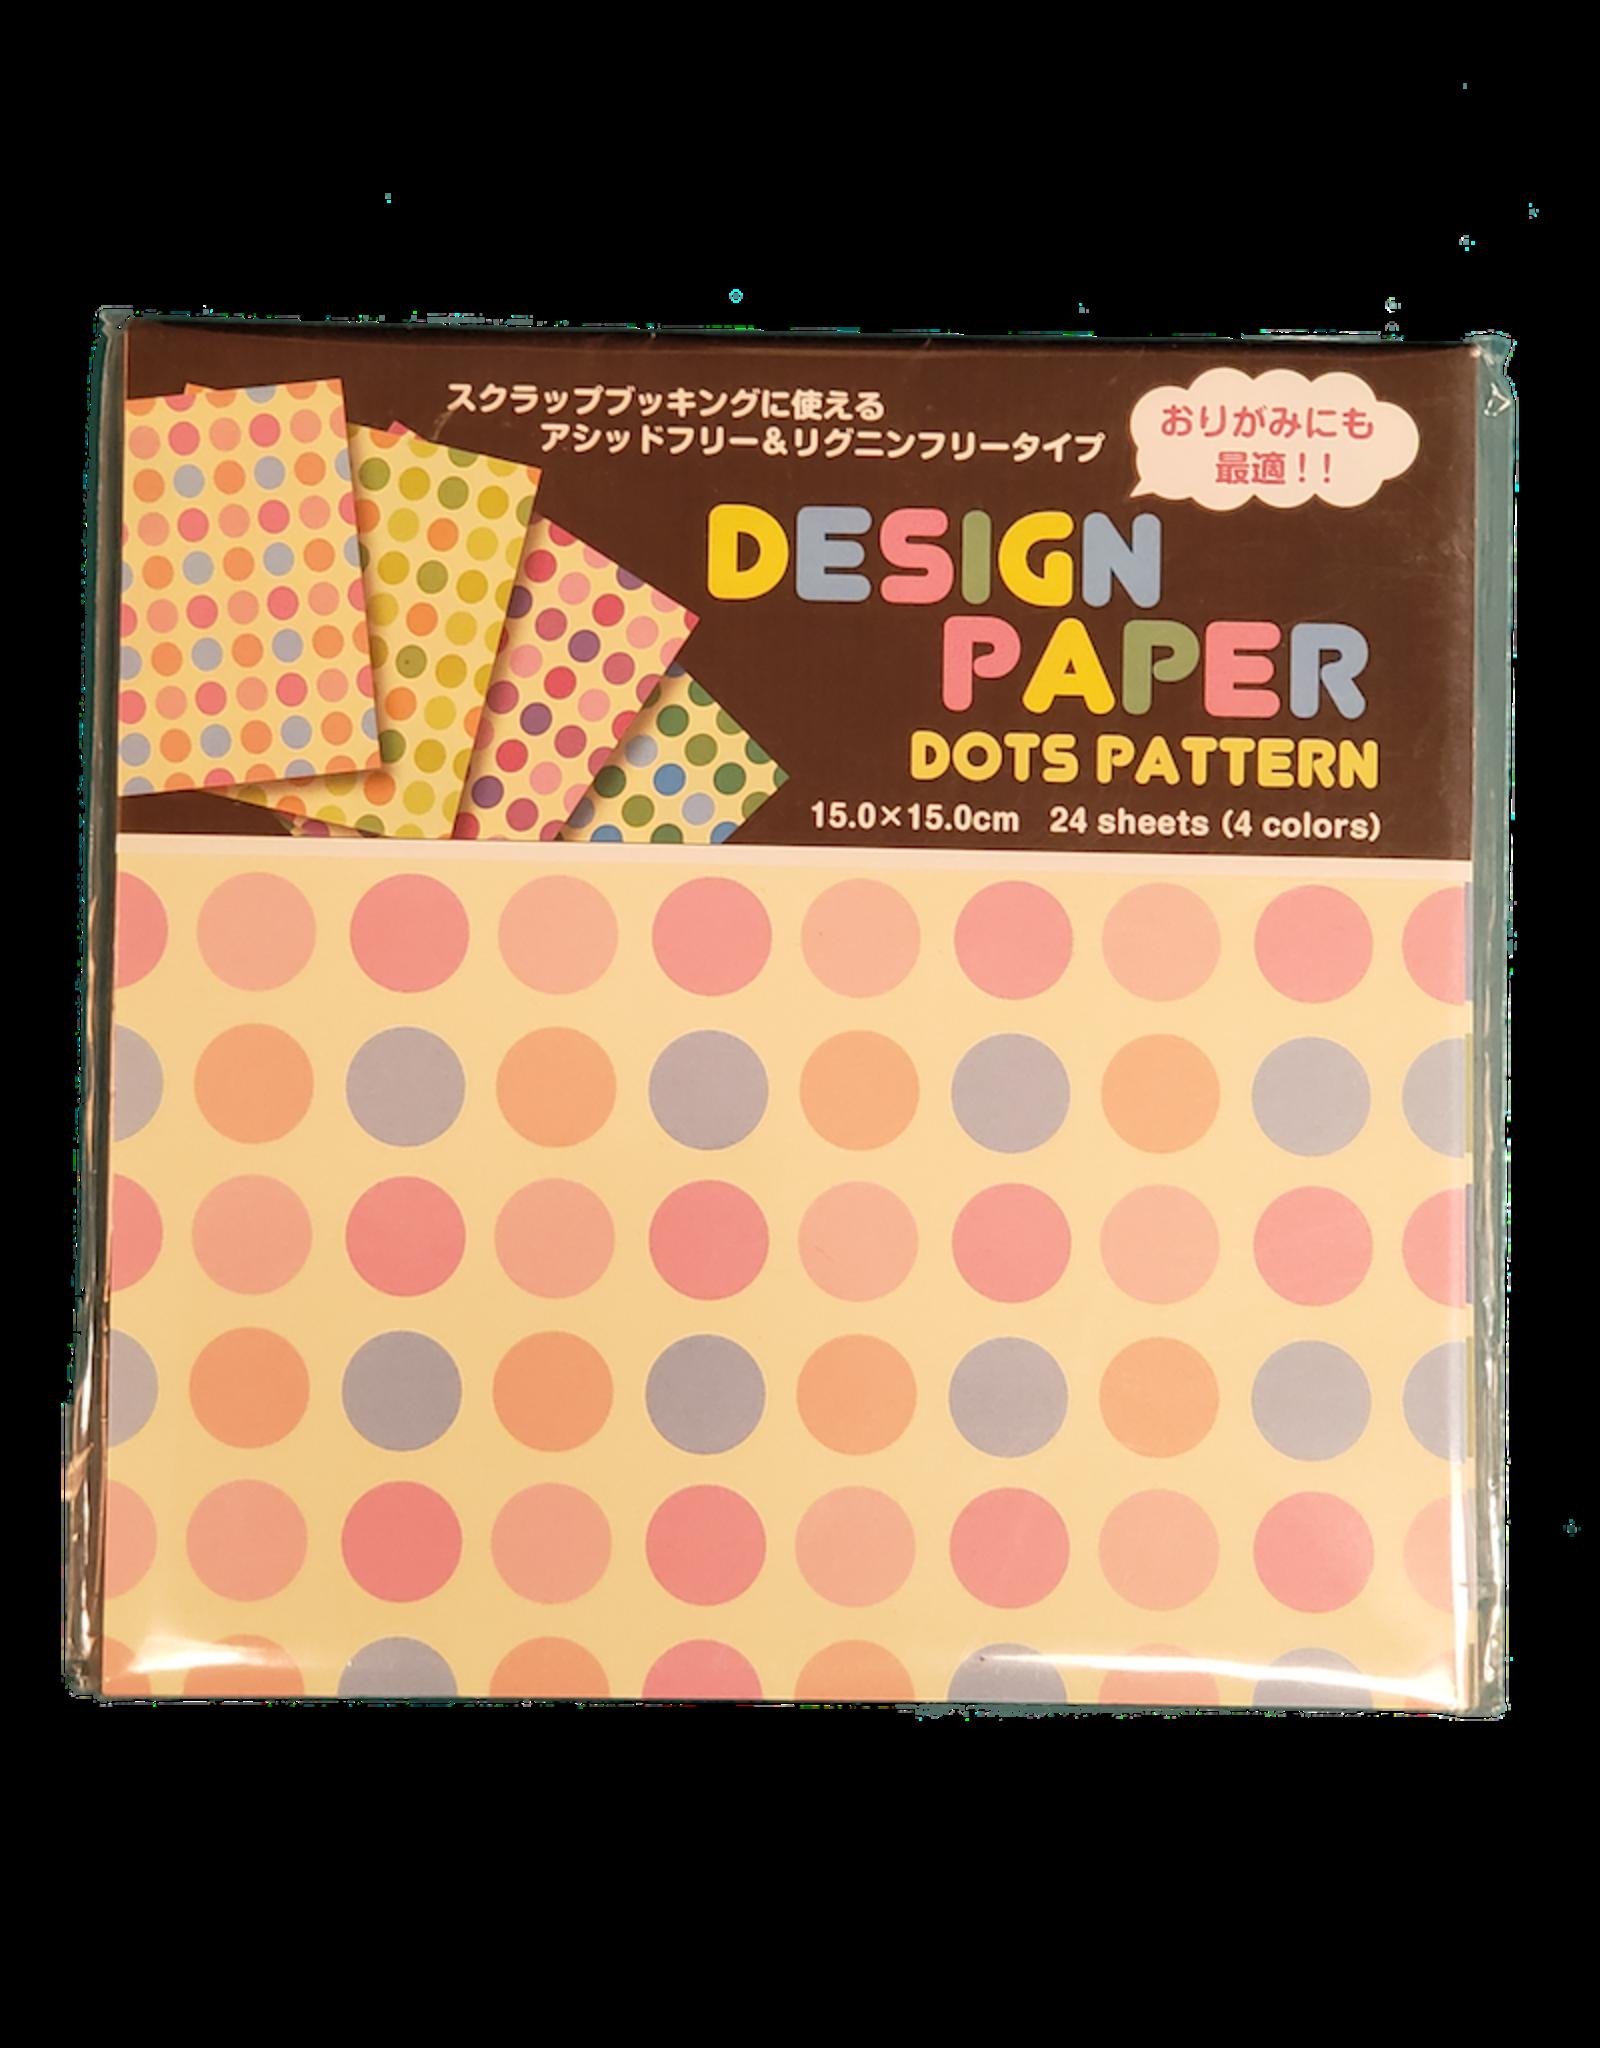 Kotobuki Trading Co. Inc Origami Design Dots 4 Colors (24)